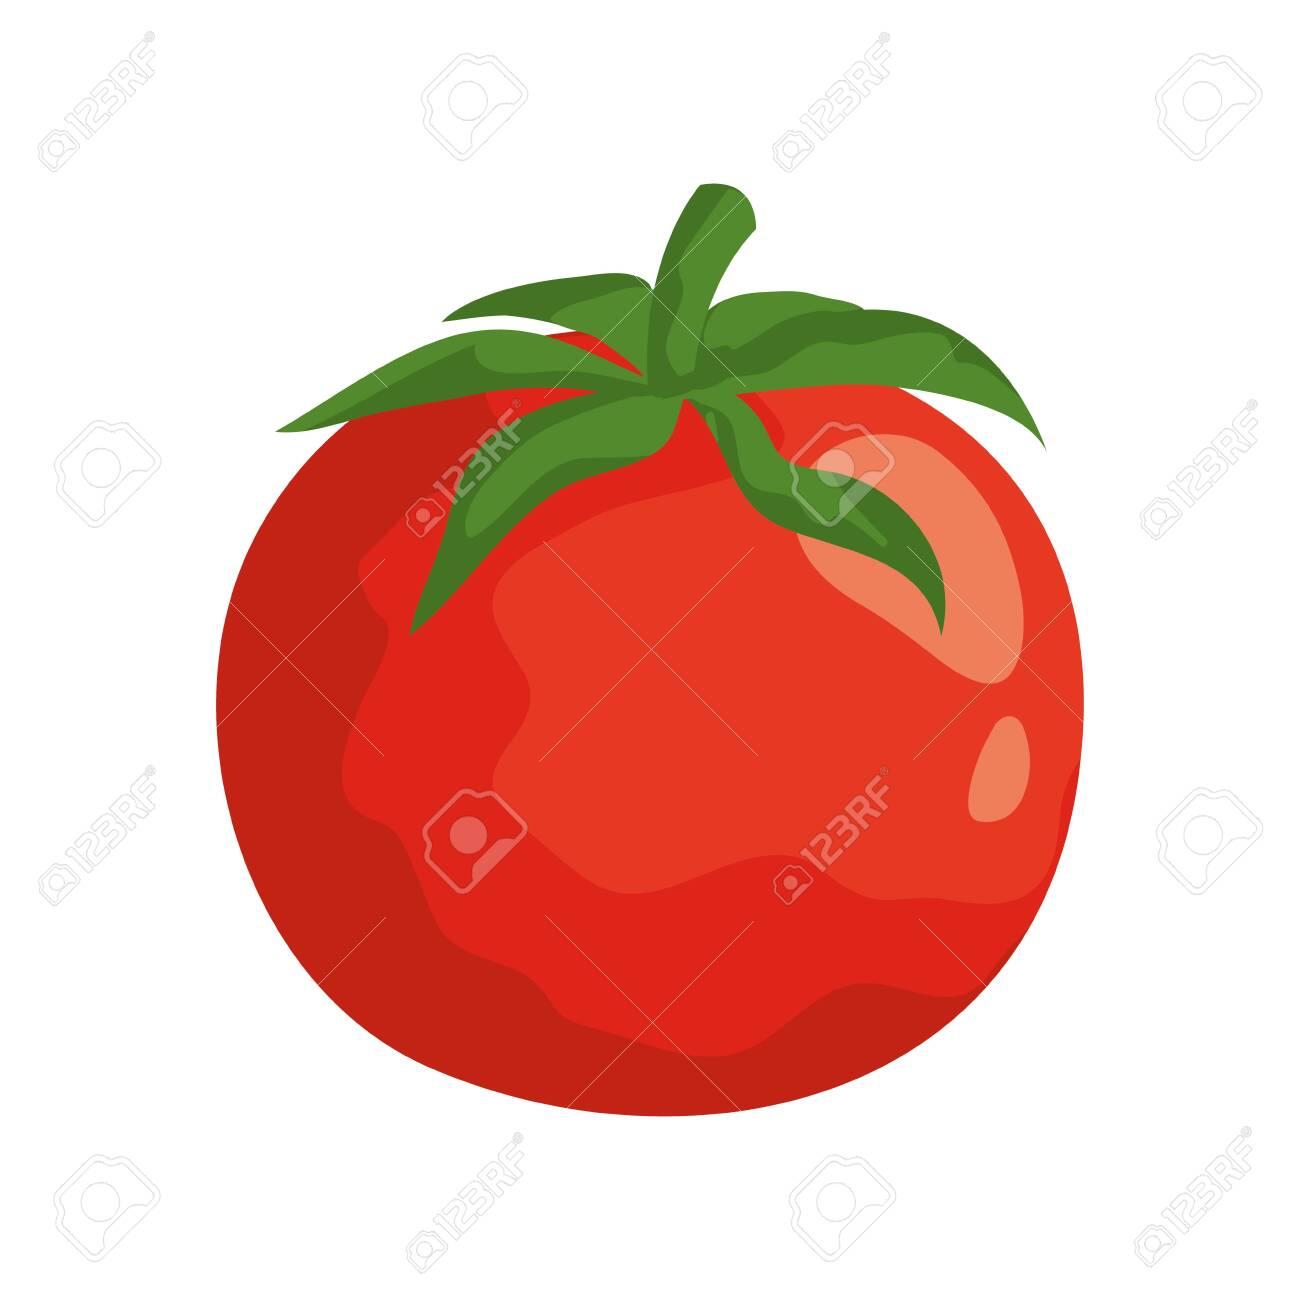 fresh tomato vegetable nature icon vector illustration design - 129508395